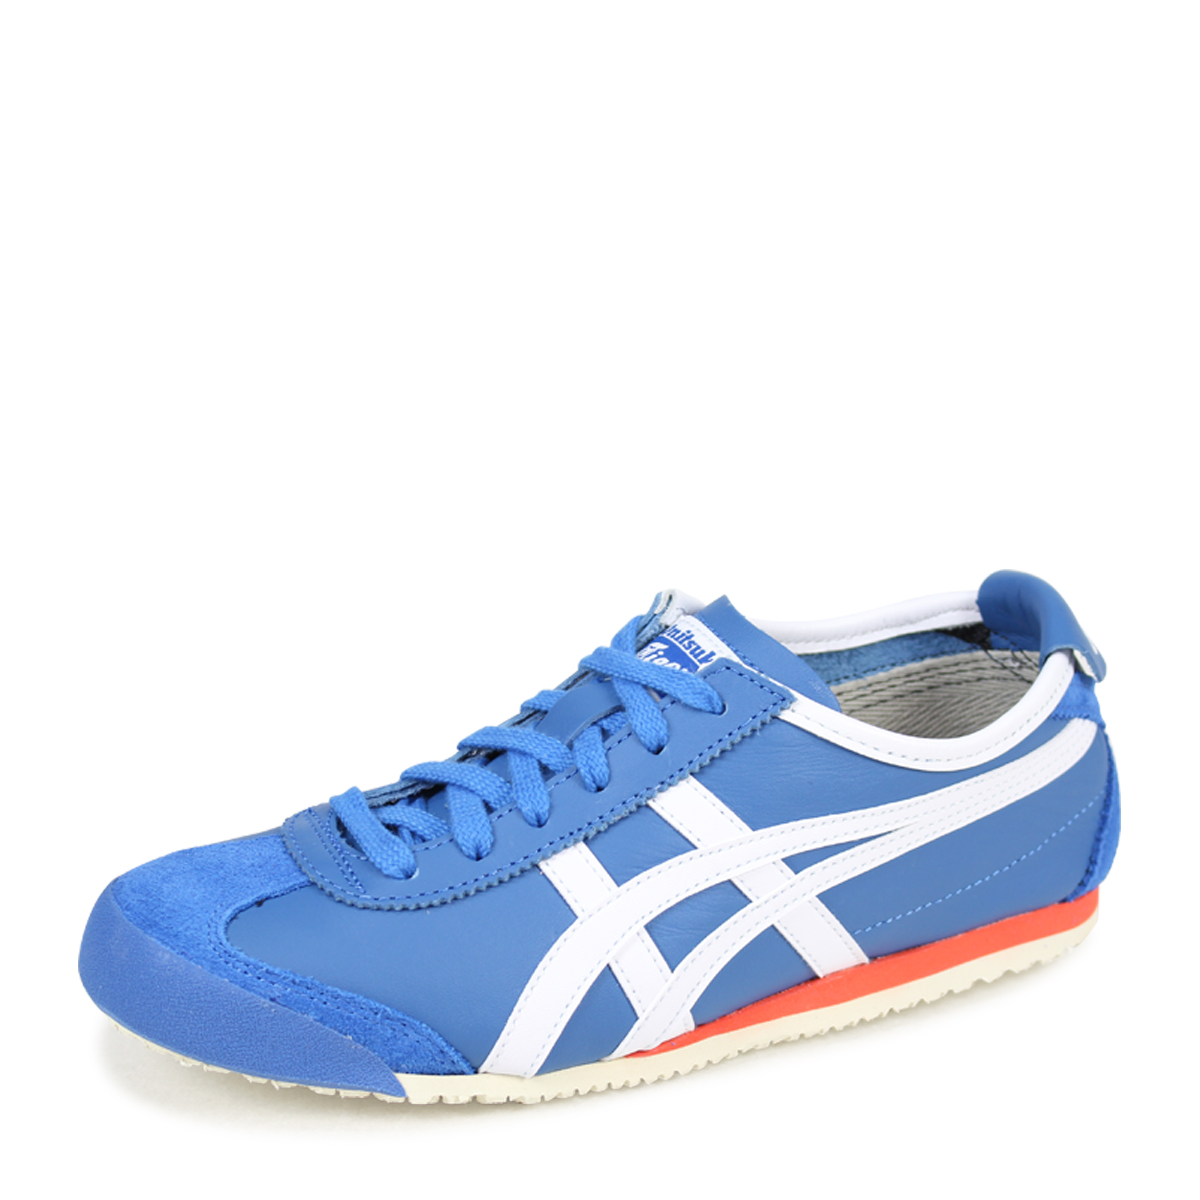 best loved 45f5c e17de Onitsuka Tiger MEXICO 66 Onitsuka tiger Mexico 66 men's lady's sneakers  D4J2L-4201 TH4J2L-4201 blue [183]